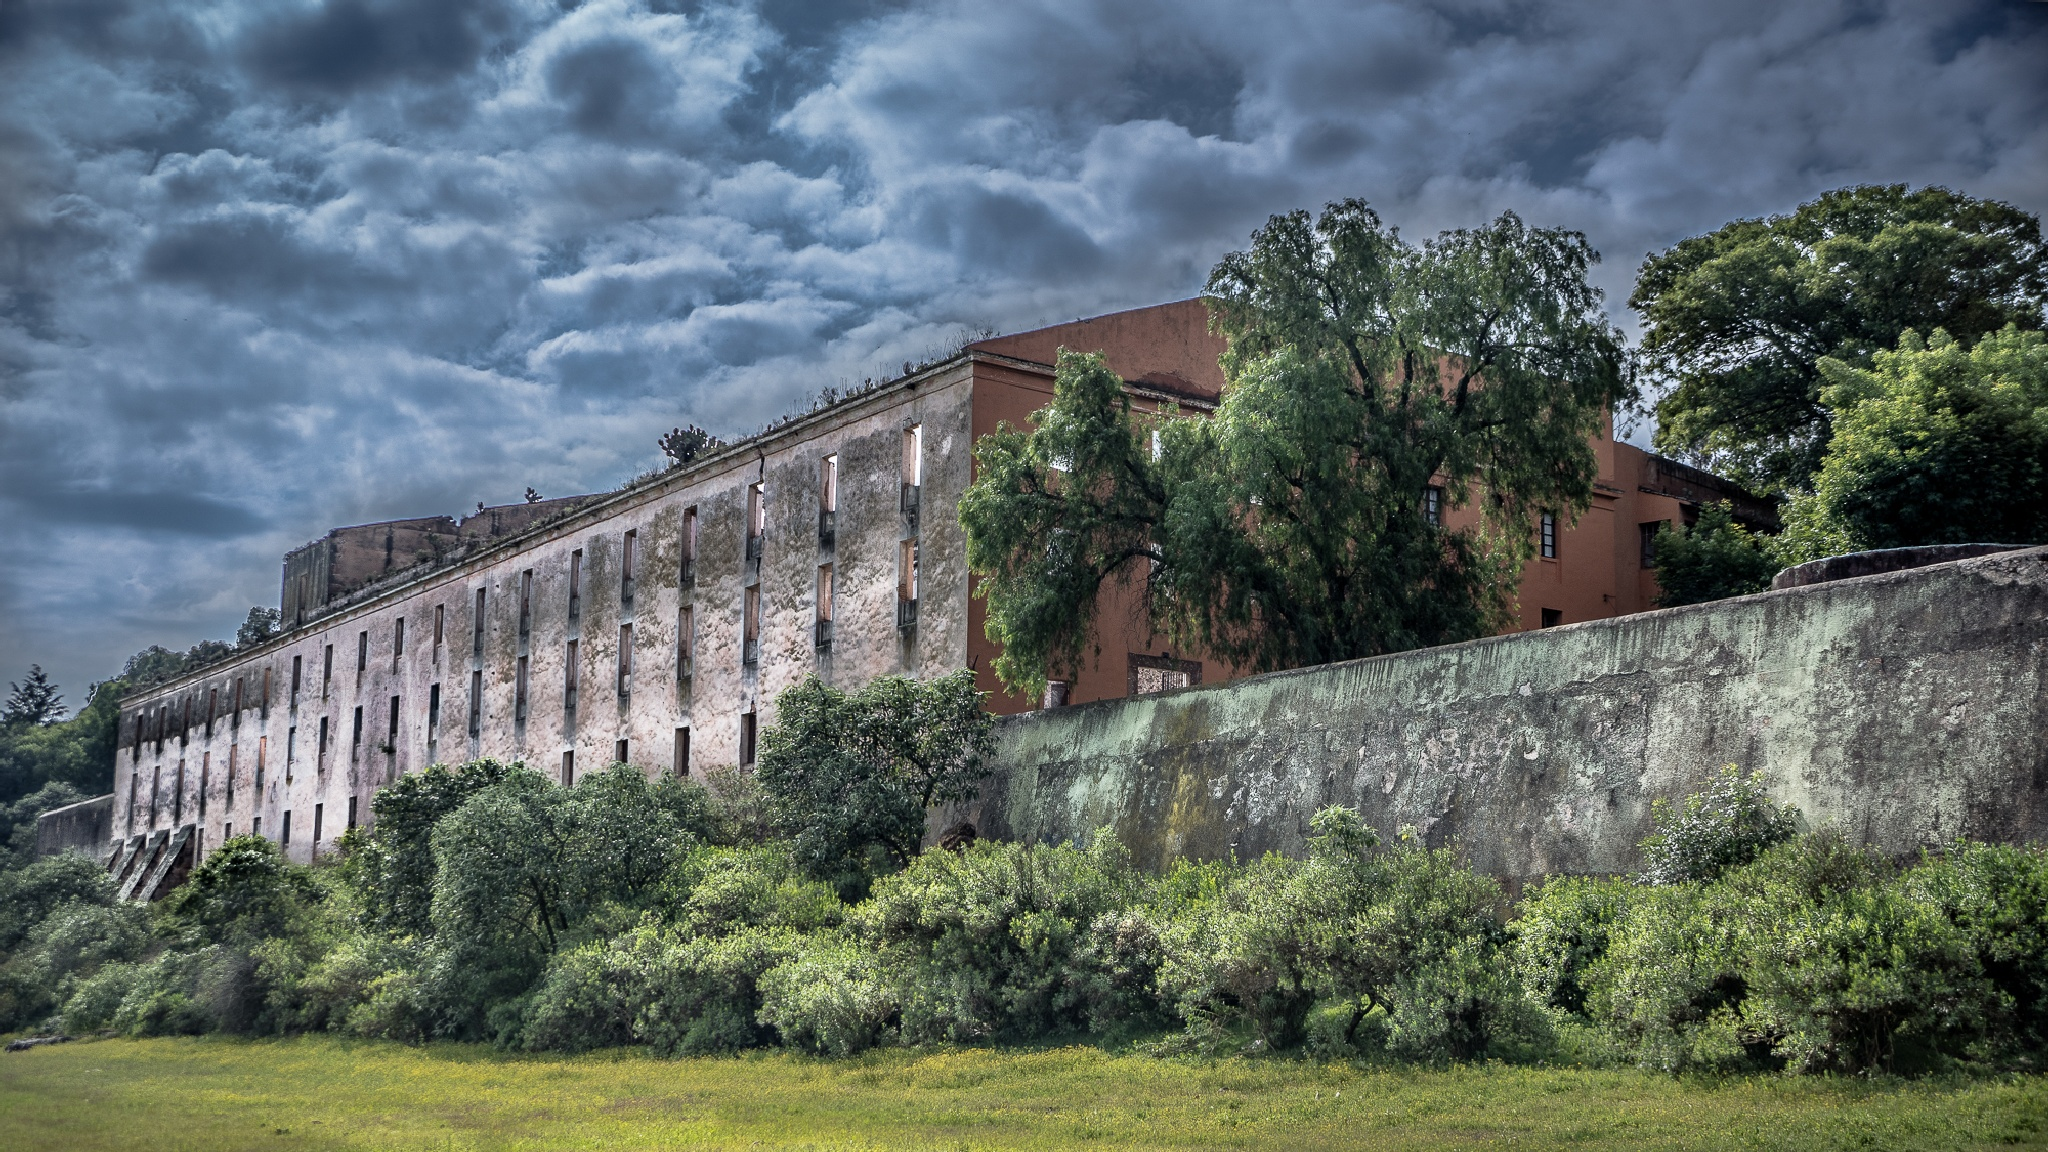 Abandoned fabrics factory by RobHarp.com